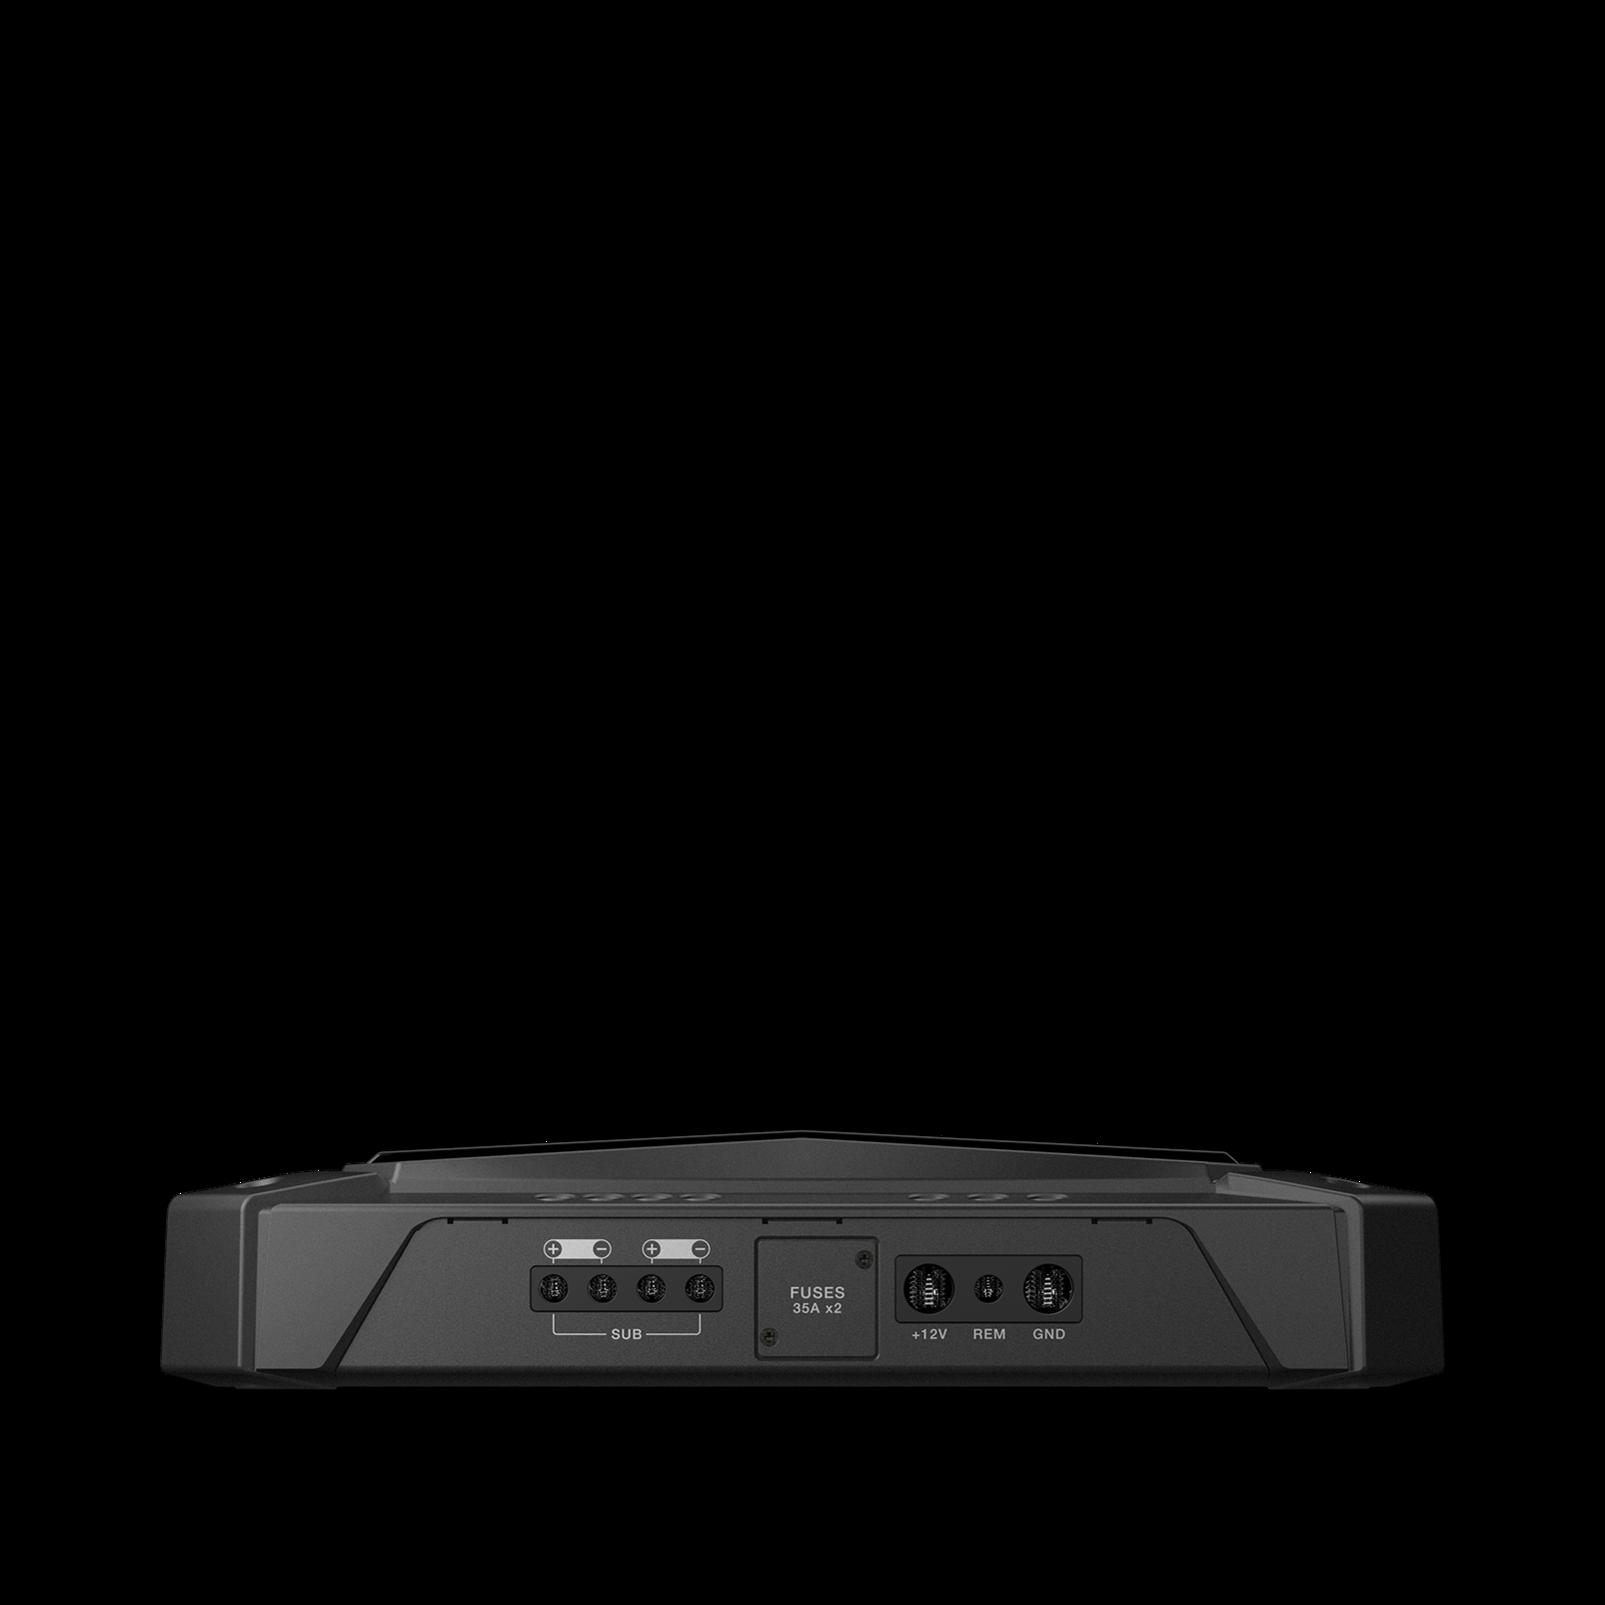 GTR-601 - Black - High Performance Mono Car Audio Subwoofer Amplifier - Detailshot 1